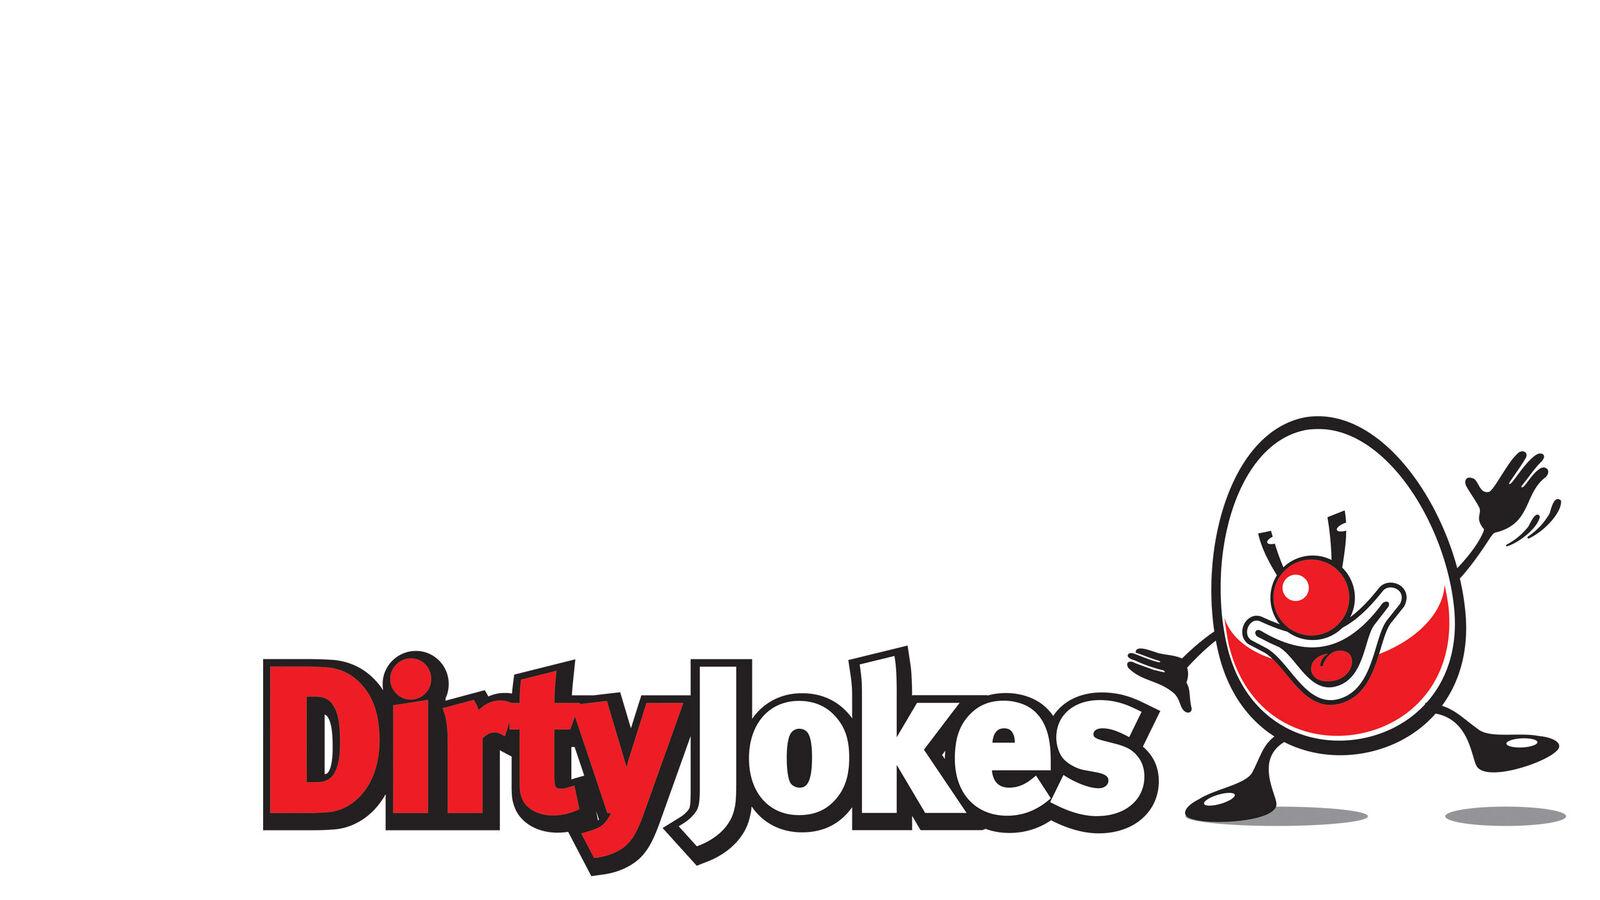 DIRTY-JOKES